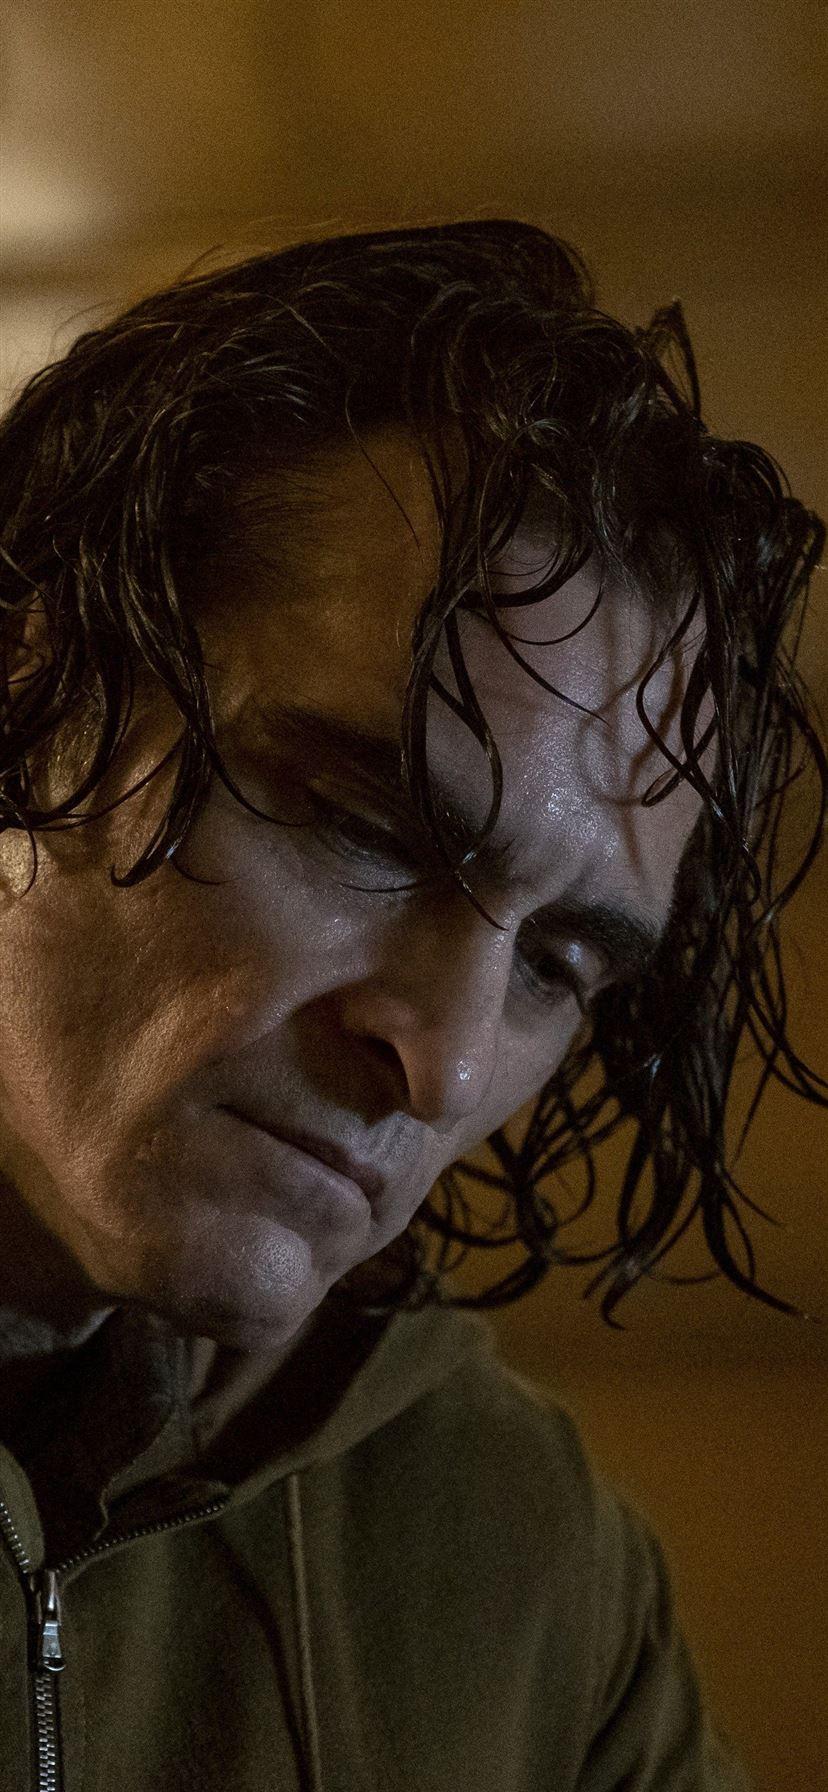 Joaquin Phoenix Still In Joker Movie 4k Iphone Wallpapers